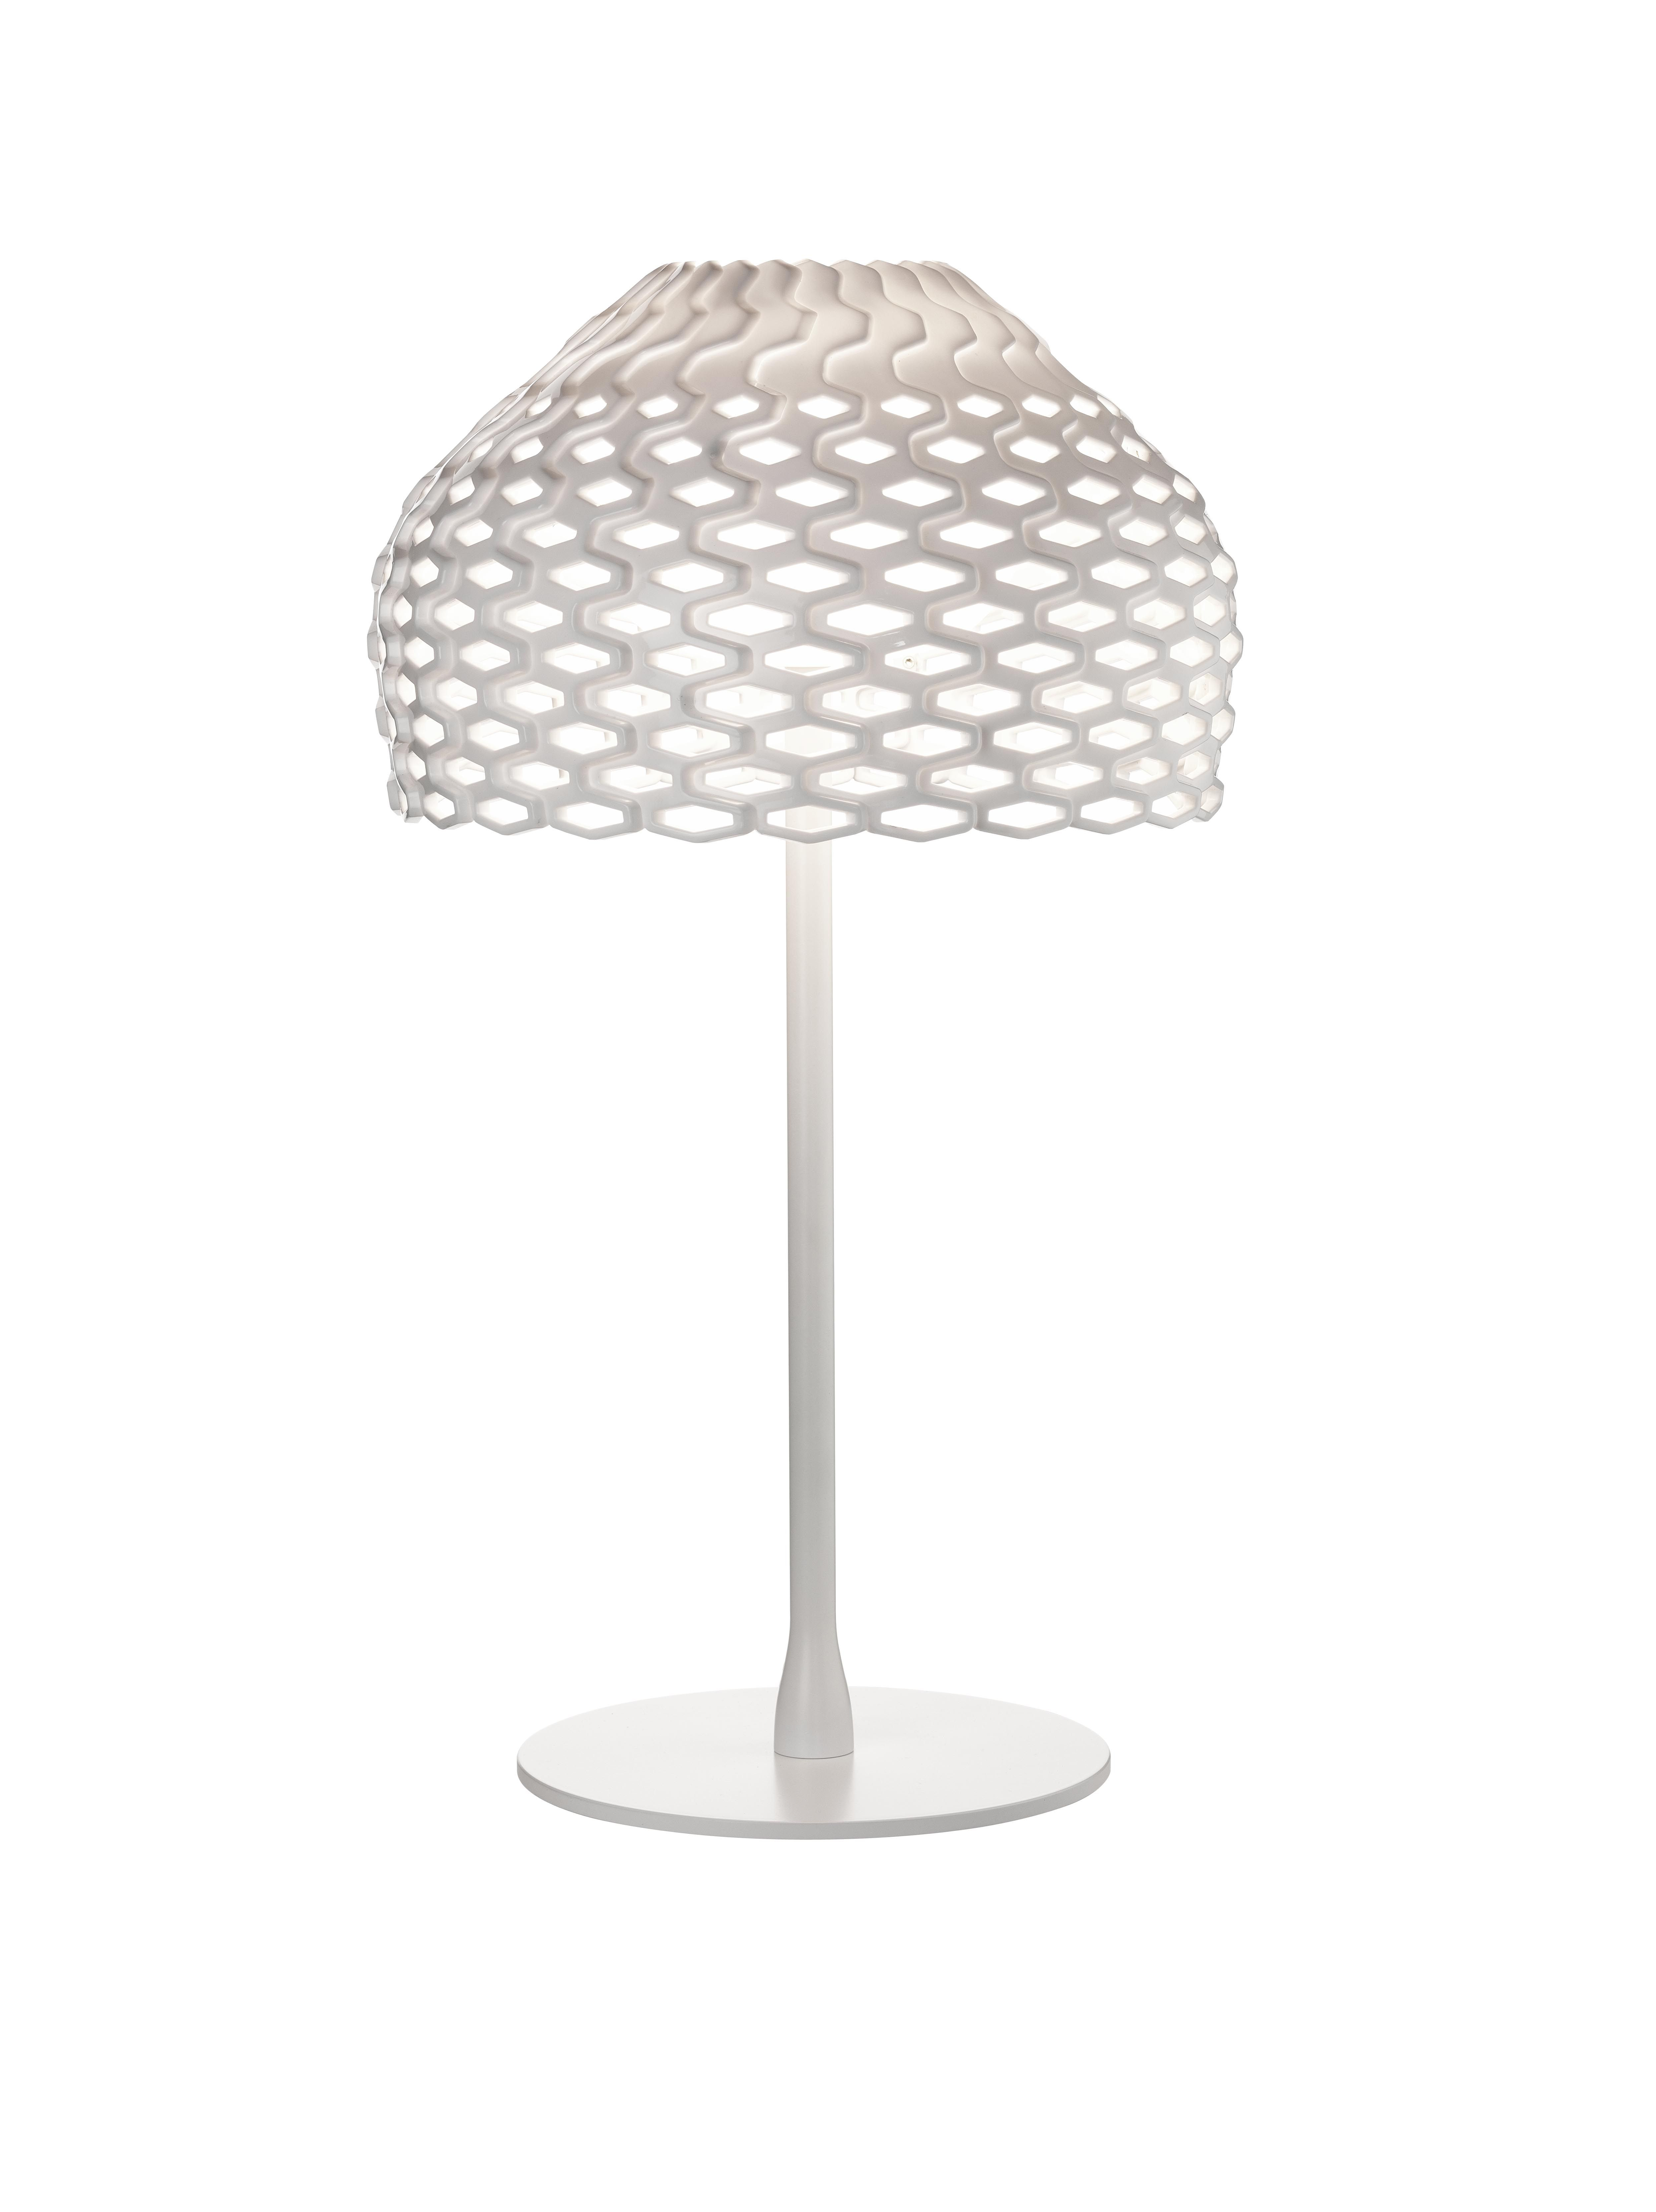 task lamps-desk lamps